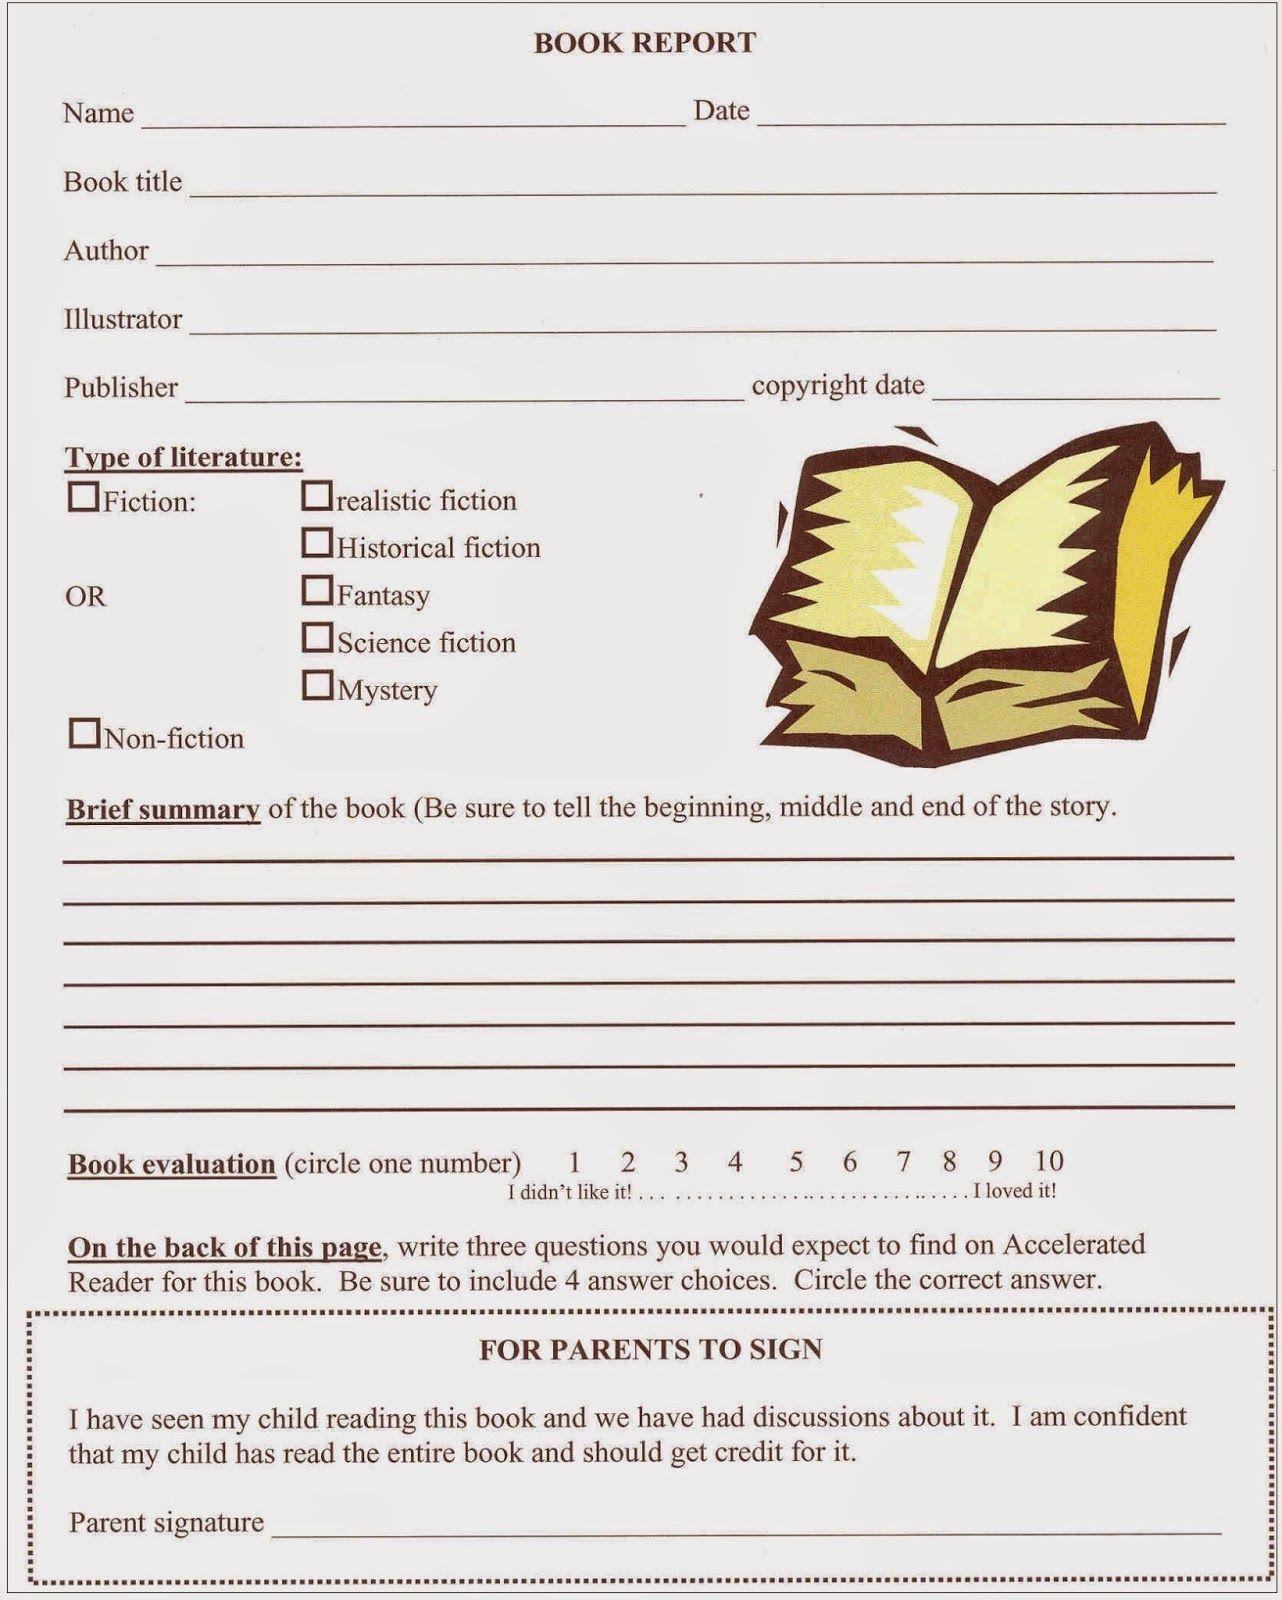 Tales of a Fourth Grade Tartan: Fourth Quarter Book Report Dates!   Book  report templates [ 1600 x 1282 Pixel ]